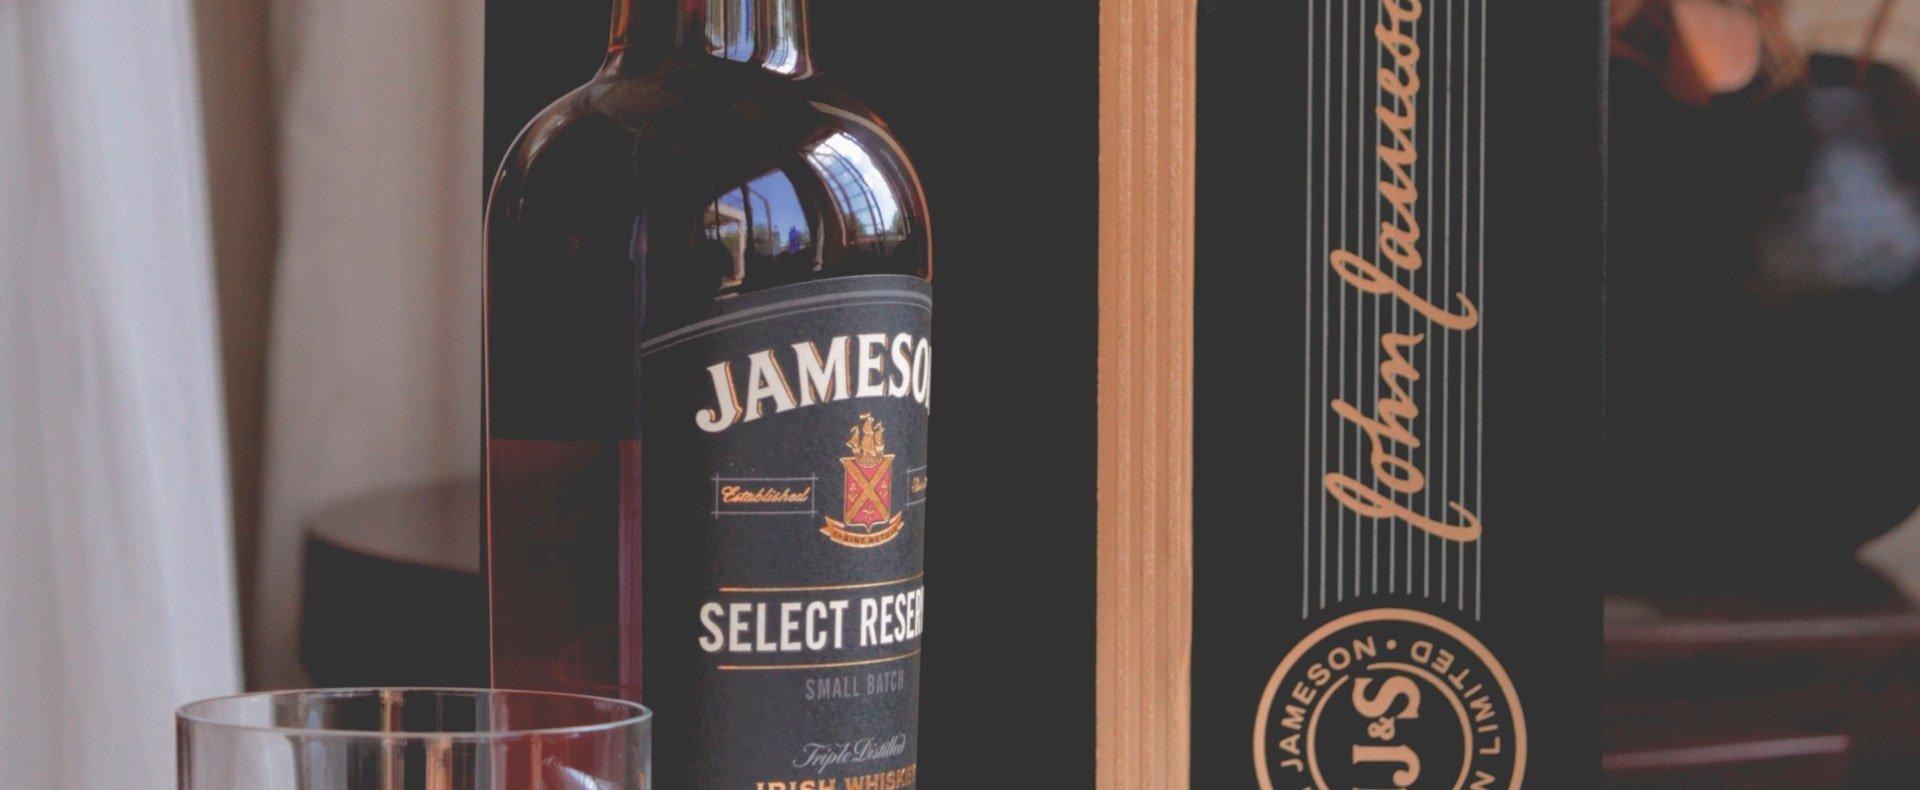 Jameson Distillery Experience Gallery